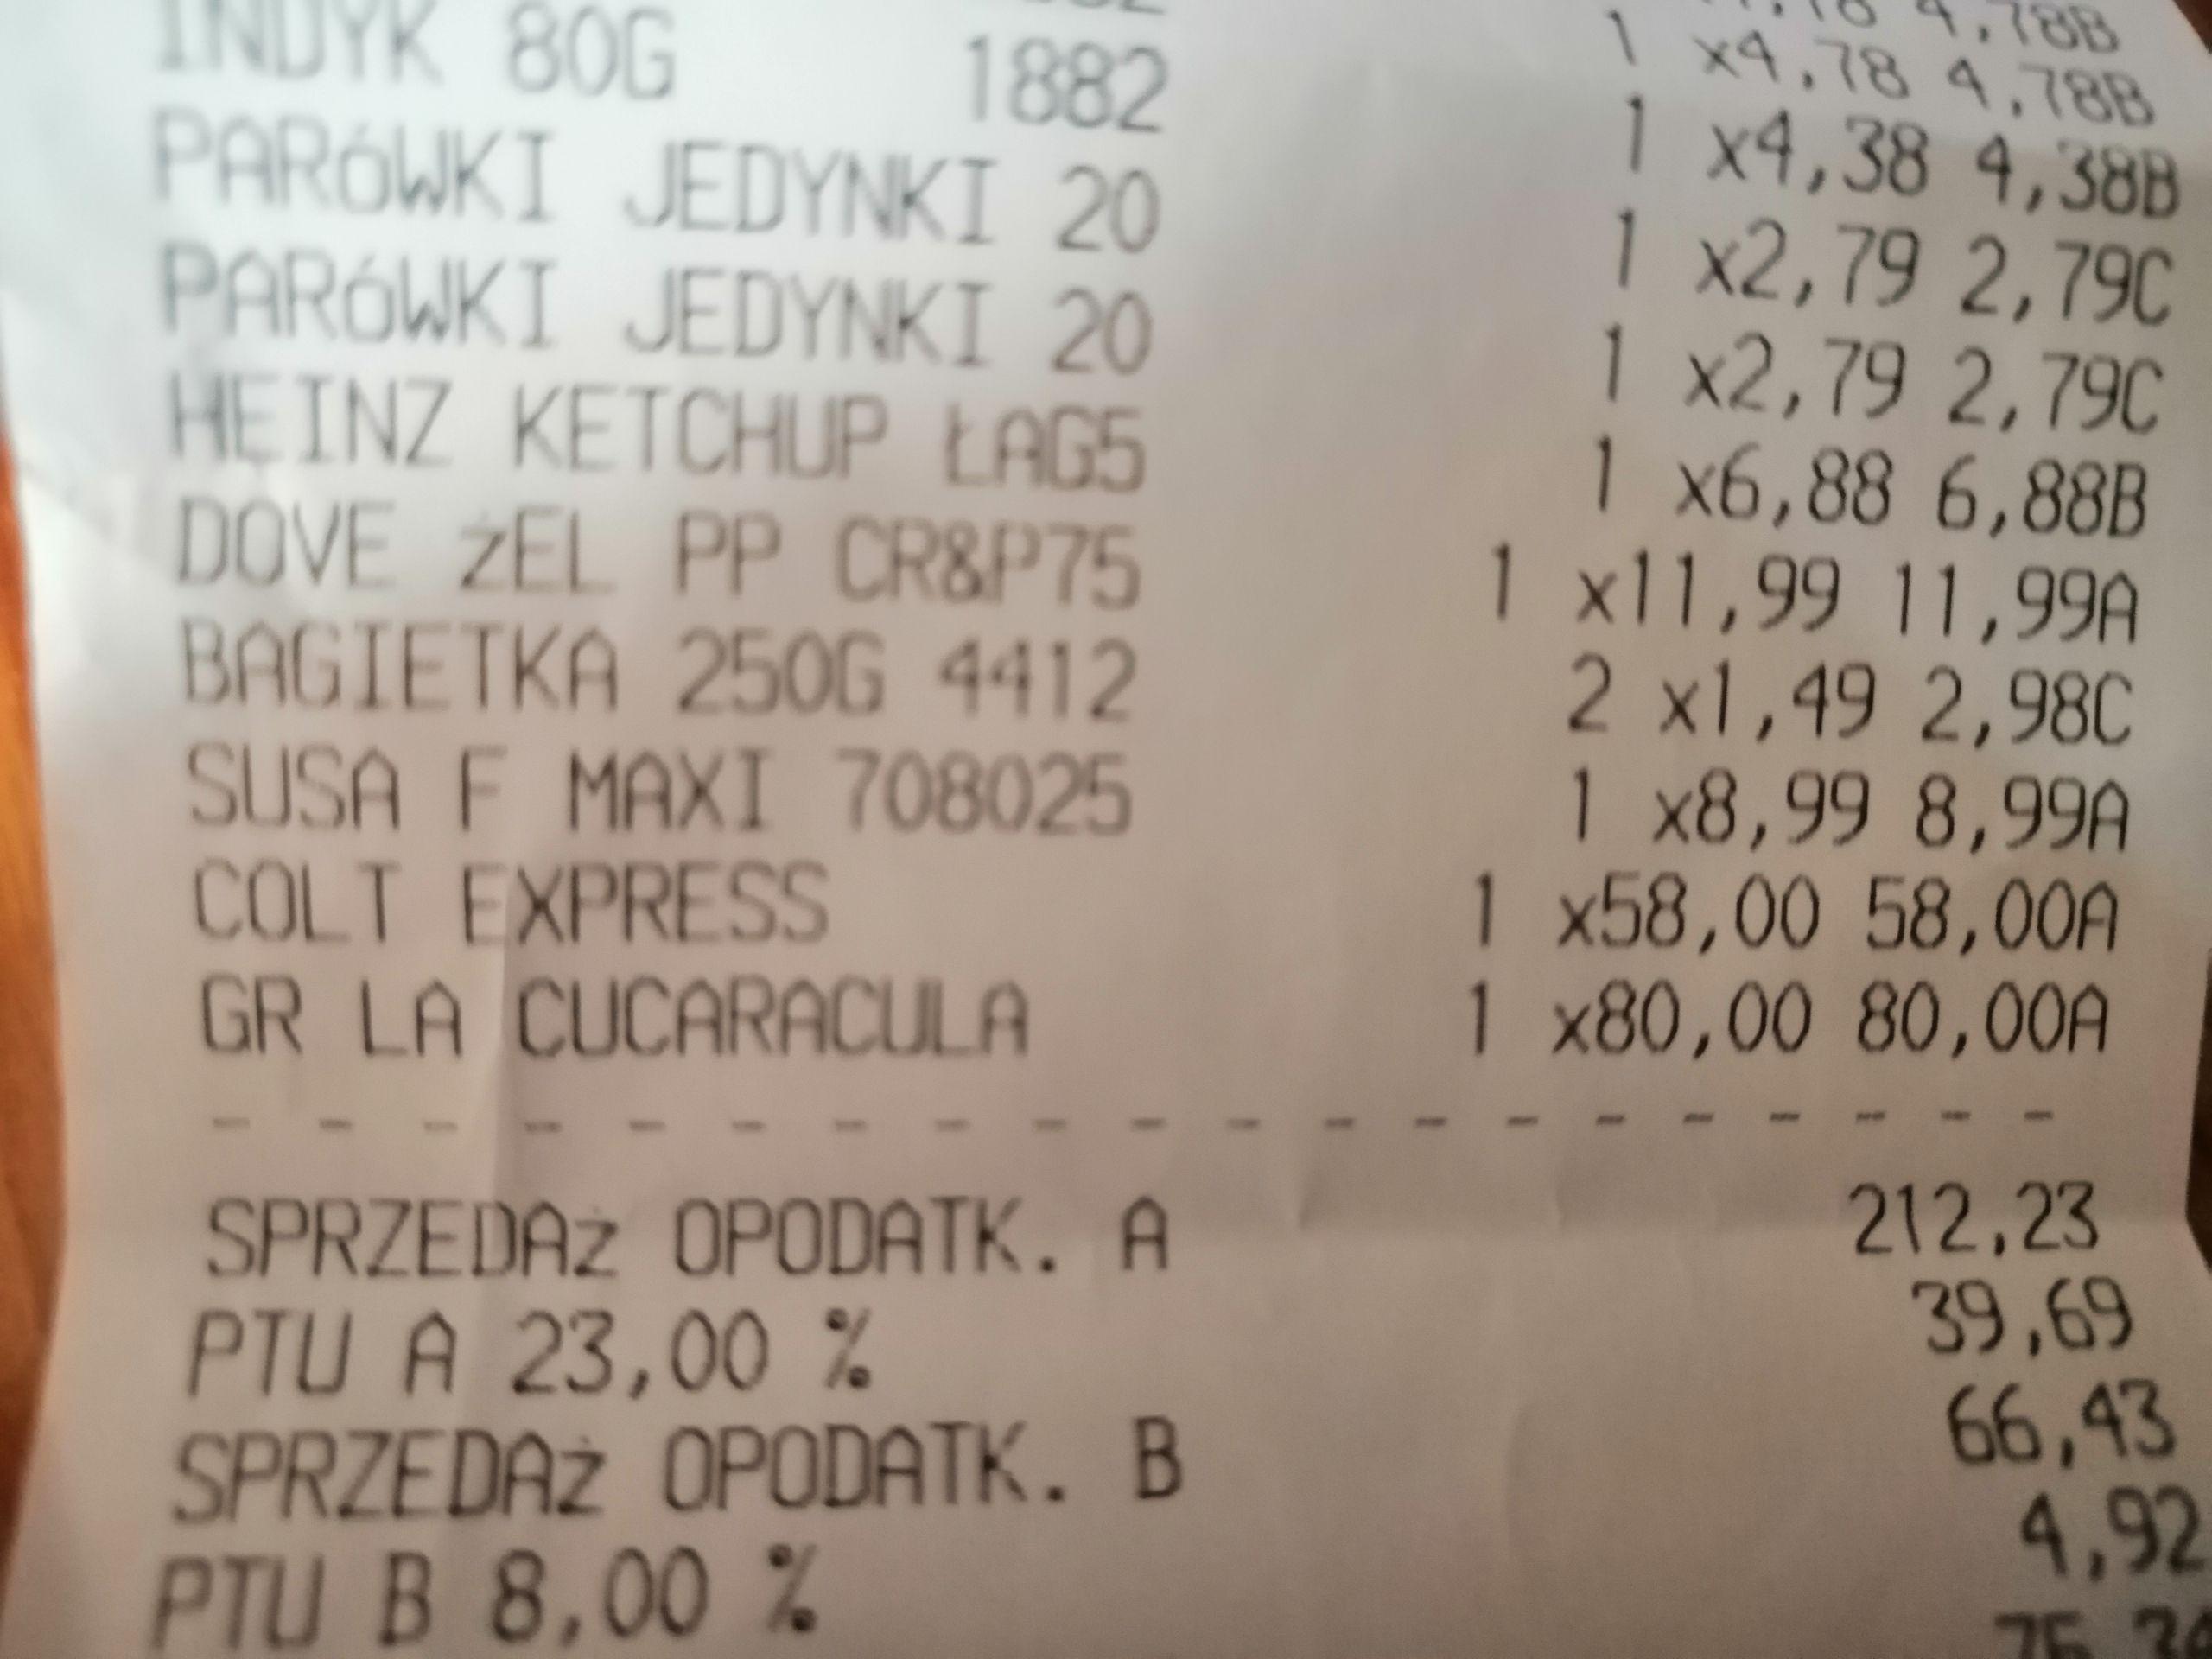 La Cucaracula gra planszowa